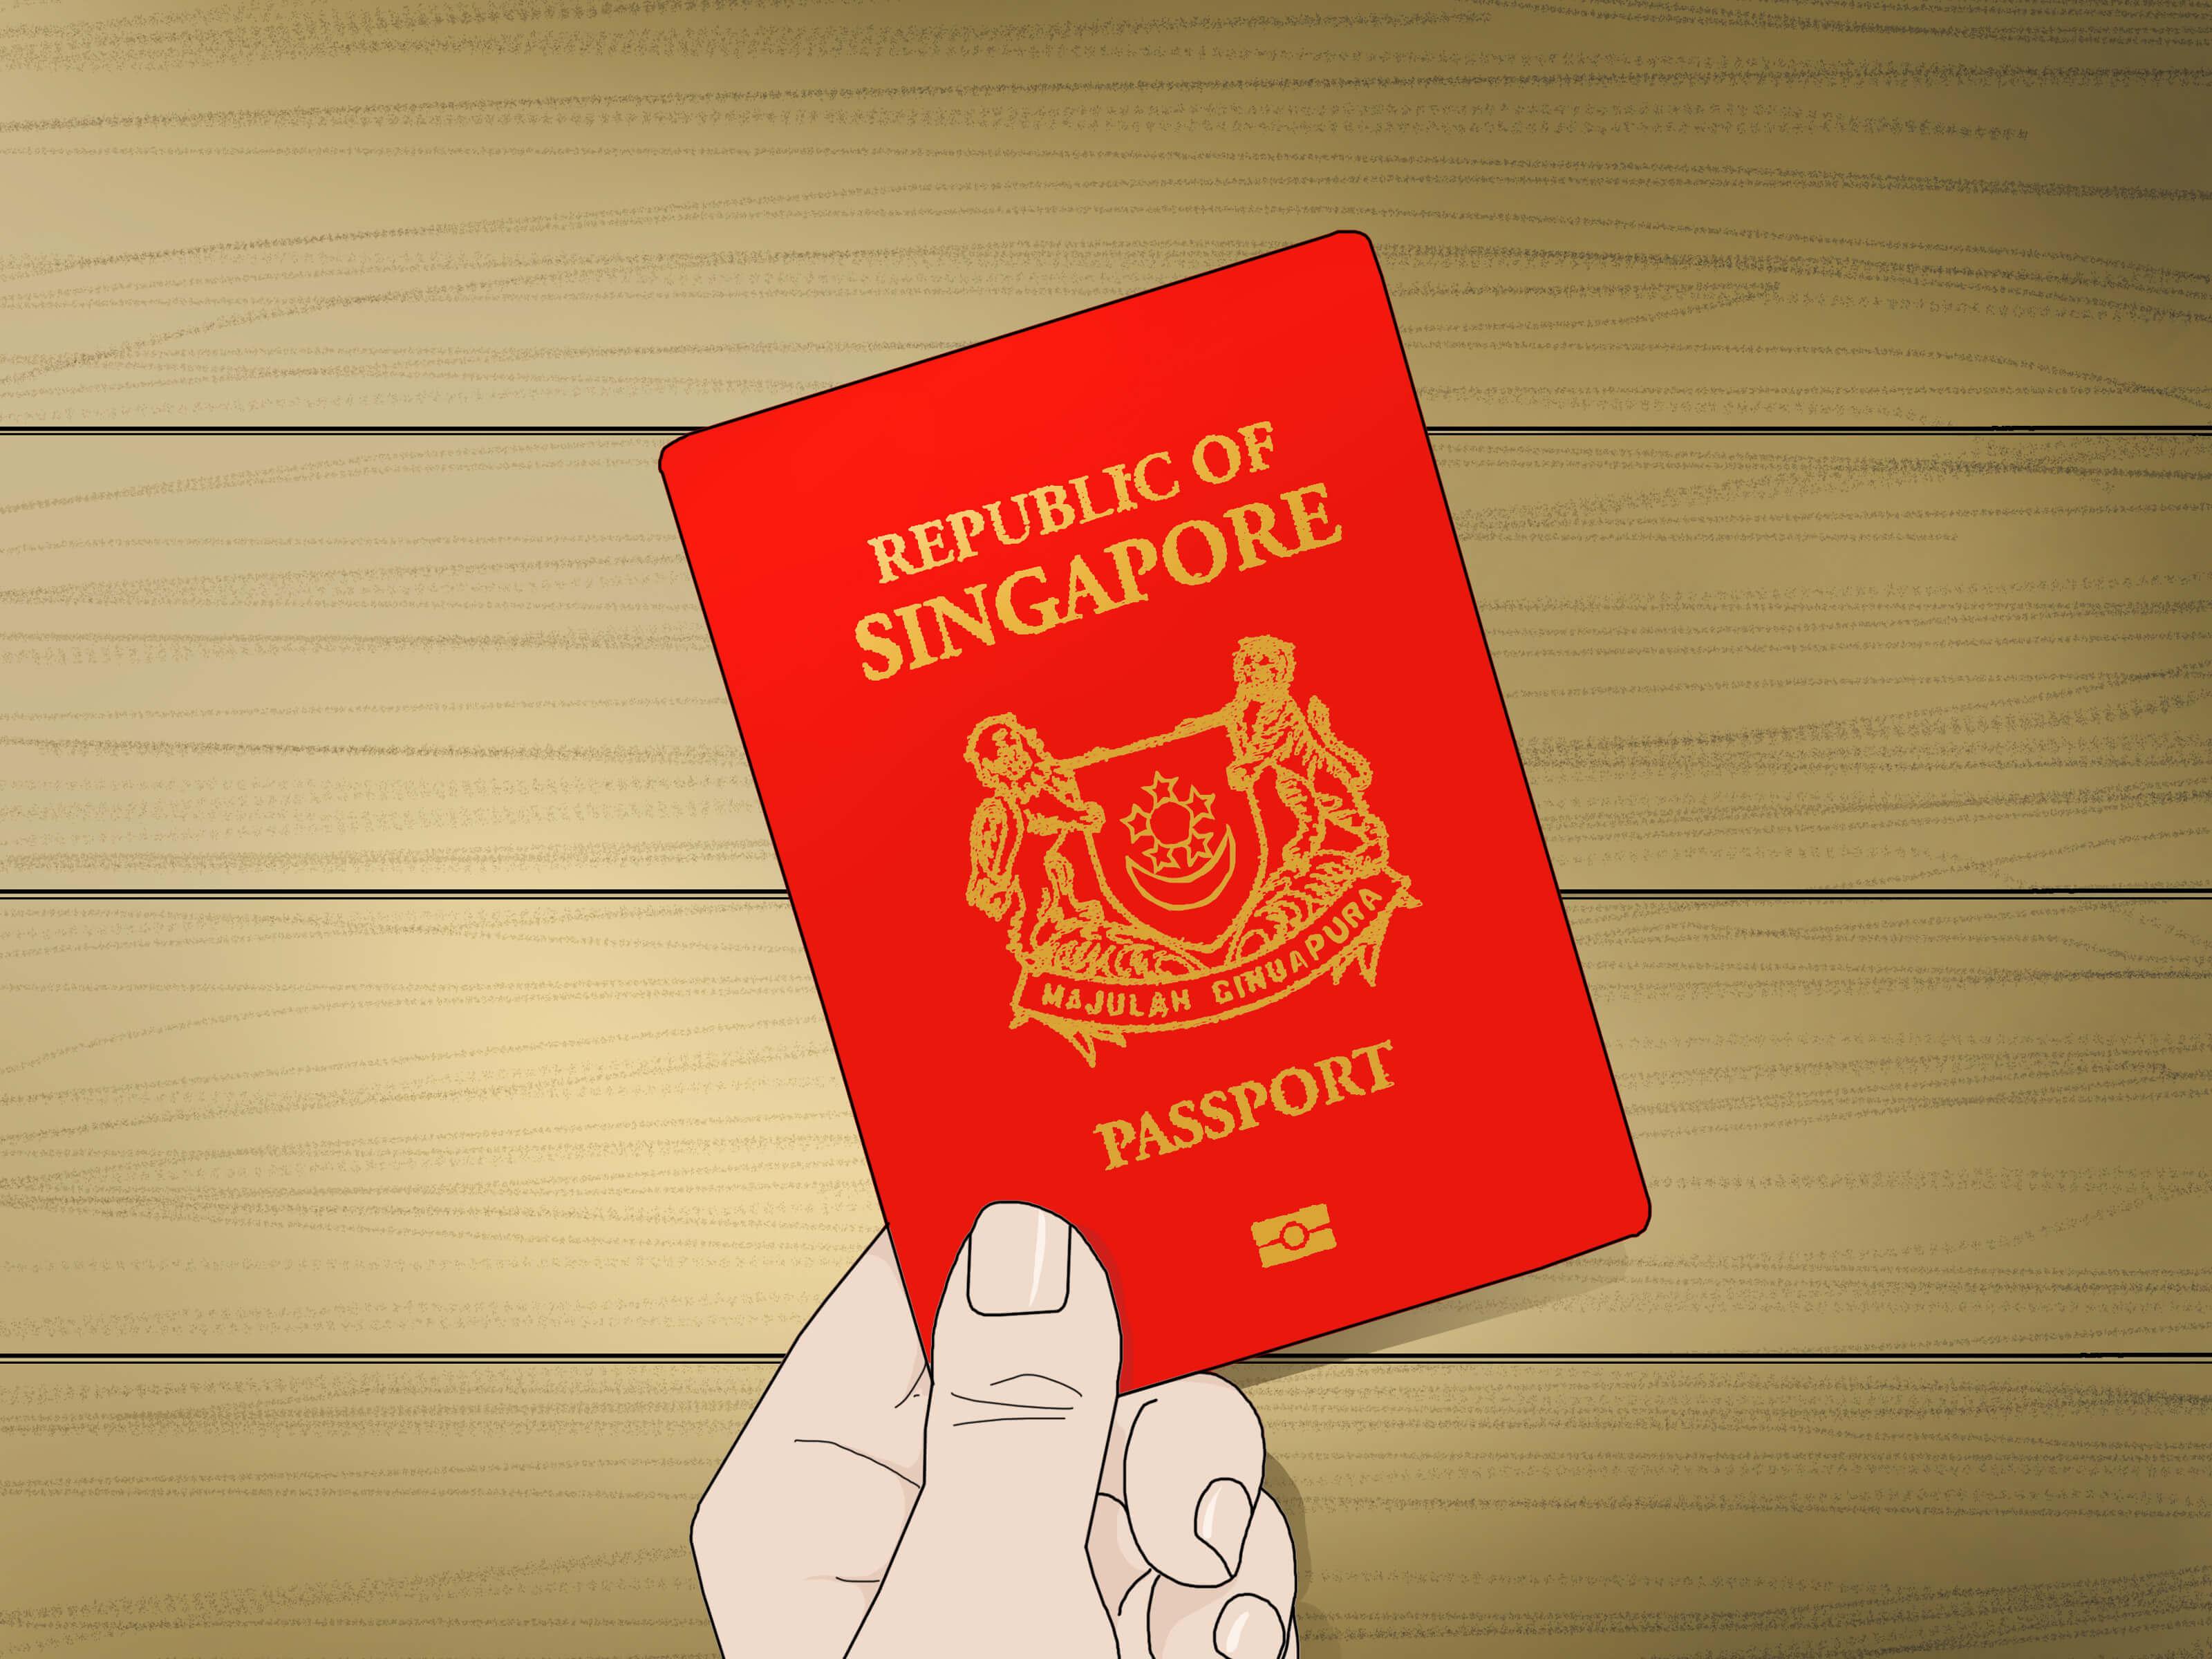 Vietnam visa extension for Singaporean citizens